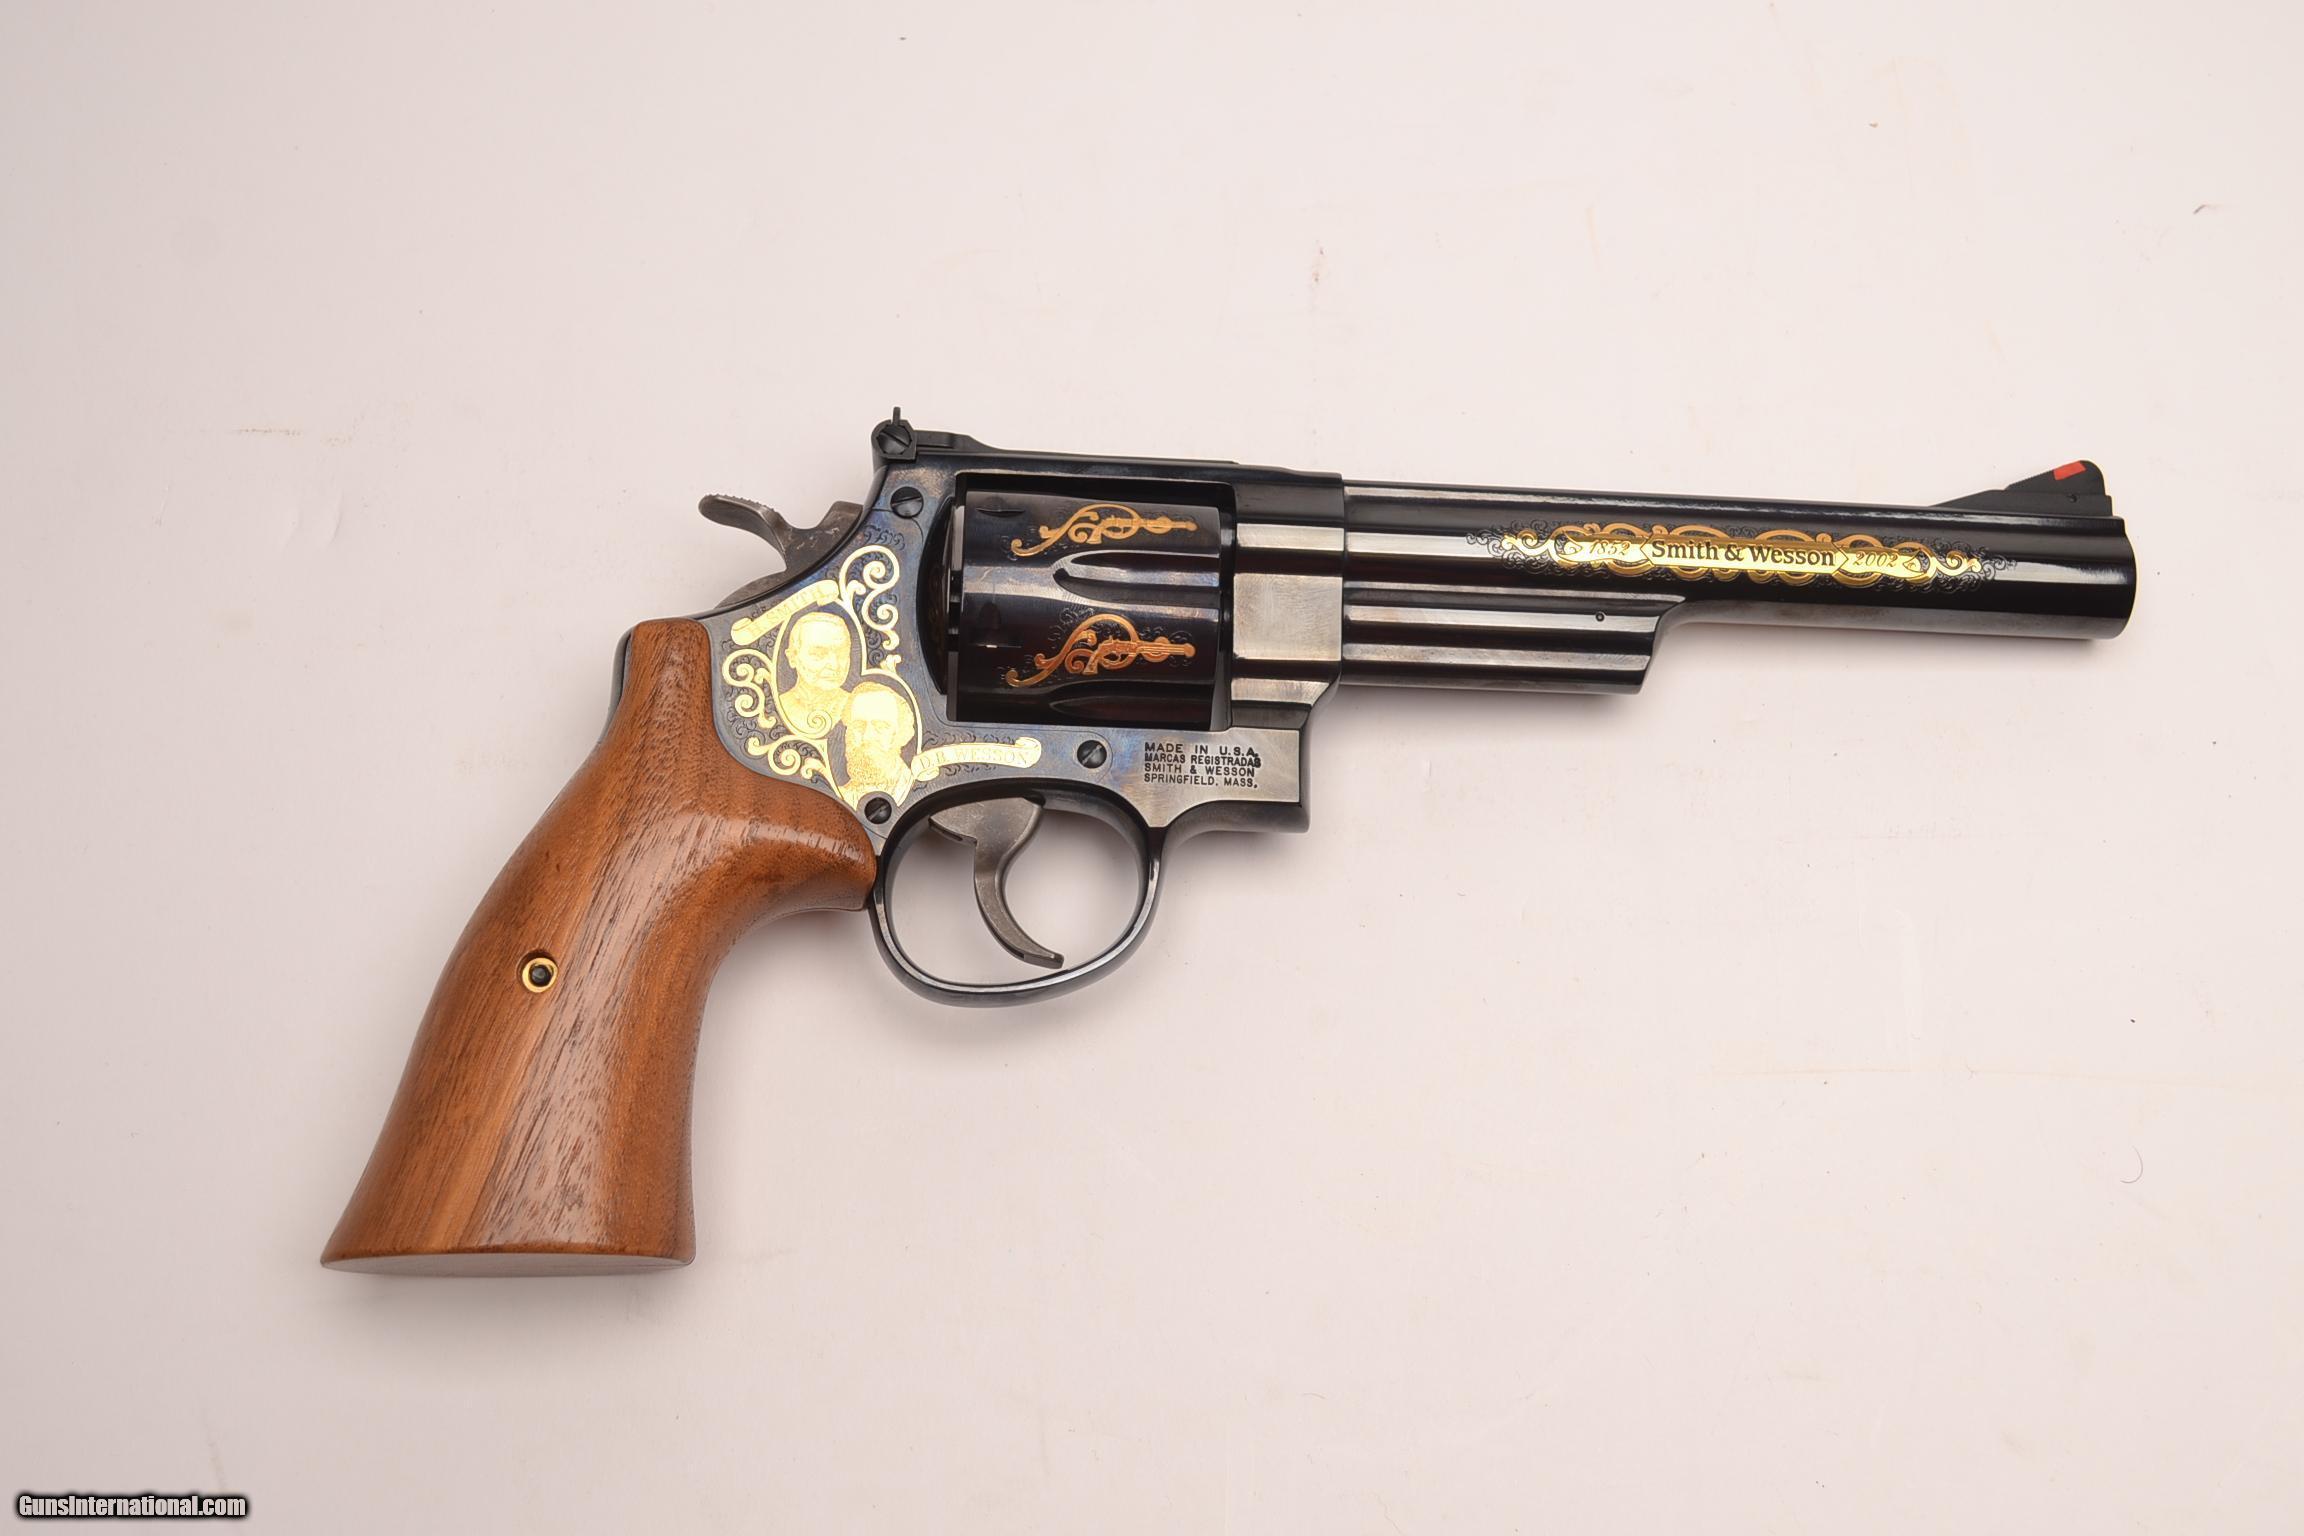 Smith & Wesson - .44 Magnum Revolver